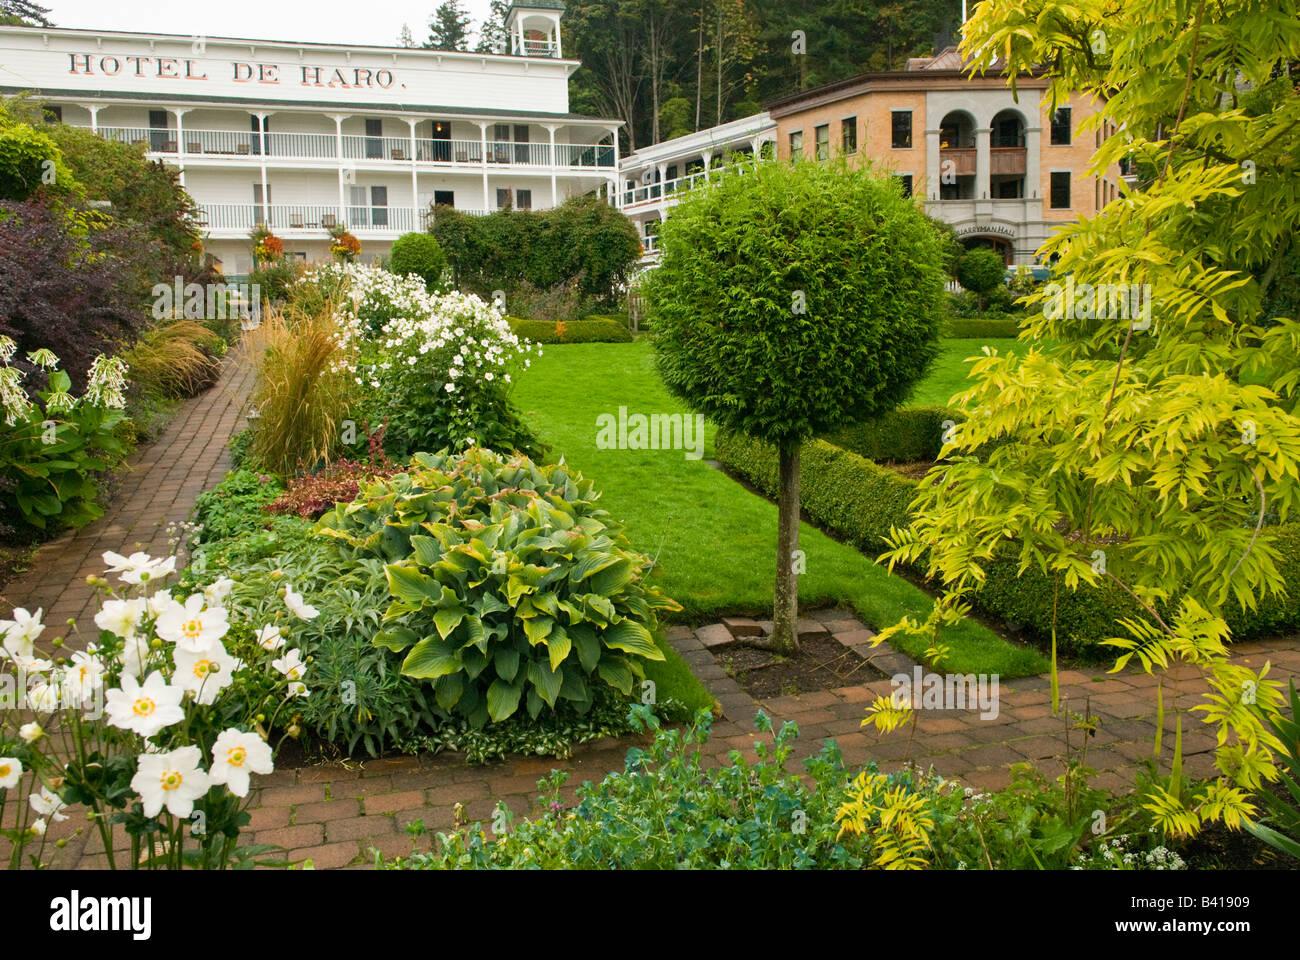 USA, WA, San Juan Island.  Roche Harbor historic Hotel de Haro and gardens with new Quarryman Hall addition - Stock Image